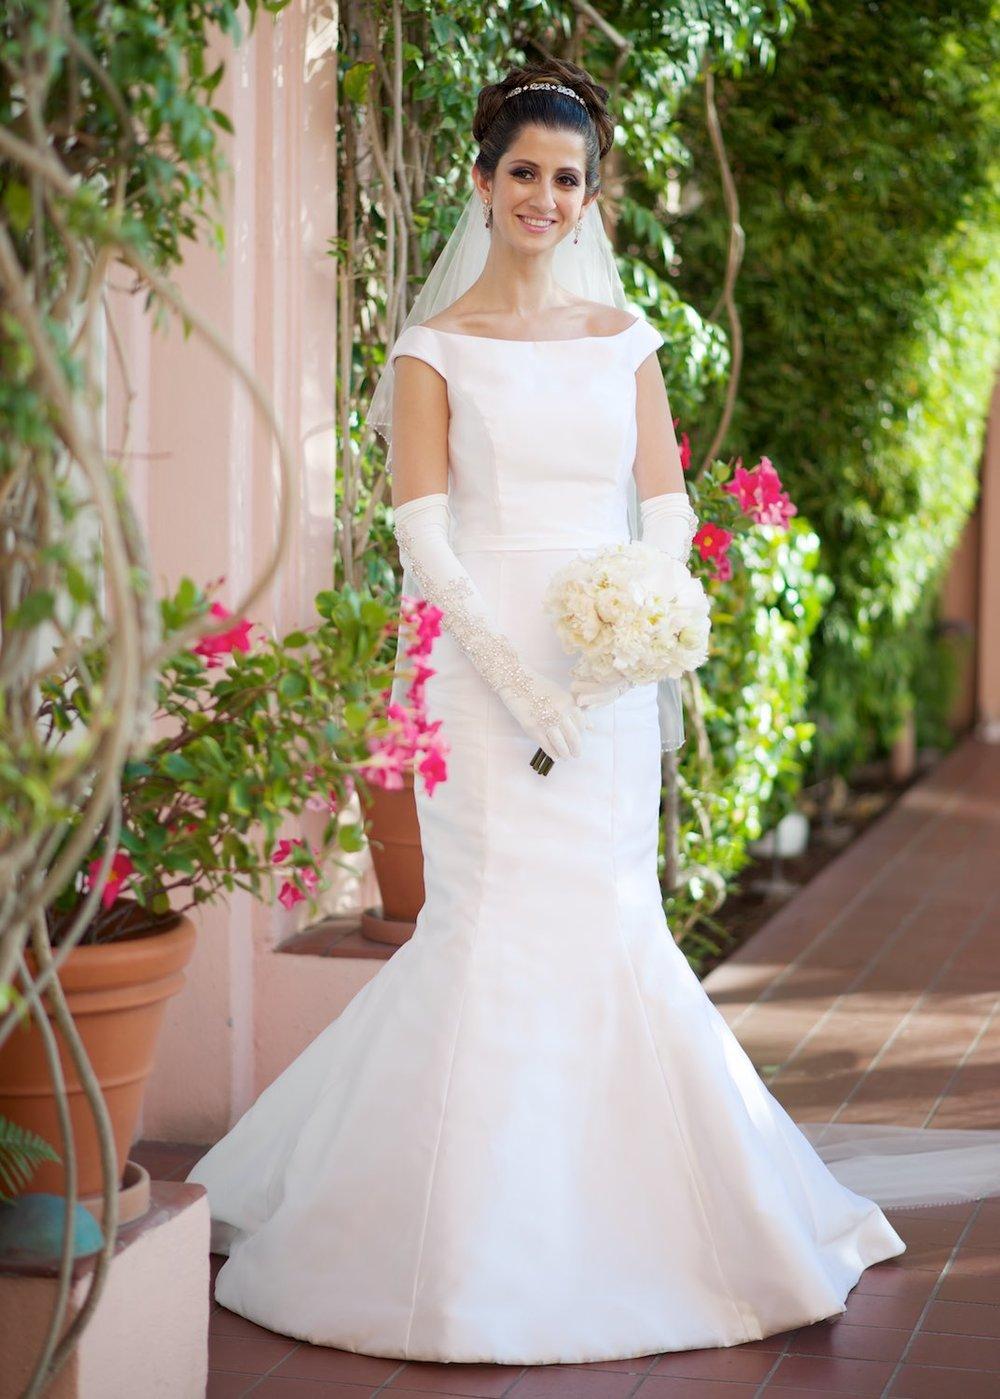 la-valencia-wedding-michal-pfeil-36.jpg